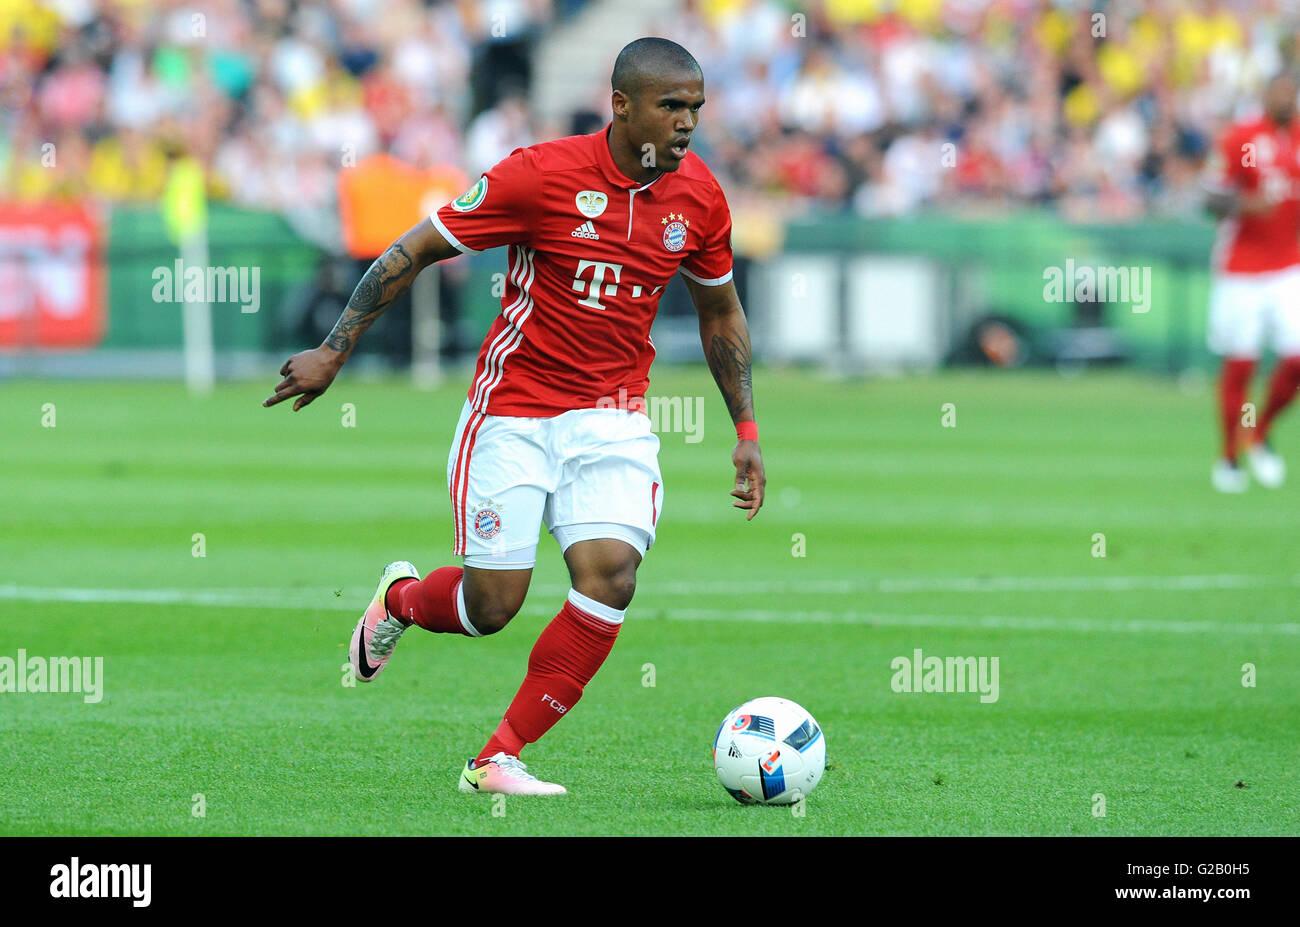 German Cup Final at Olympic Stadium Berlin, FC Bayern Munich vs Borussia Dortmund: Douglas Costa of Munich. - Stock Image